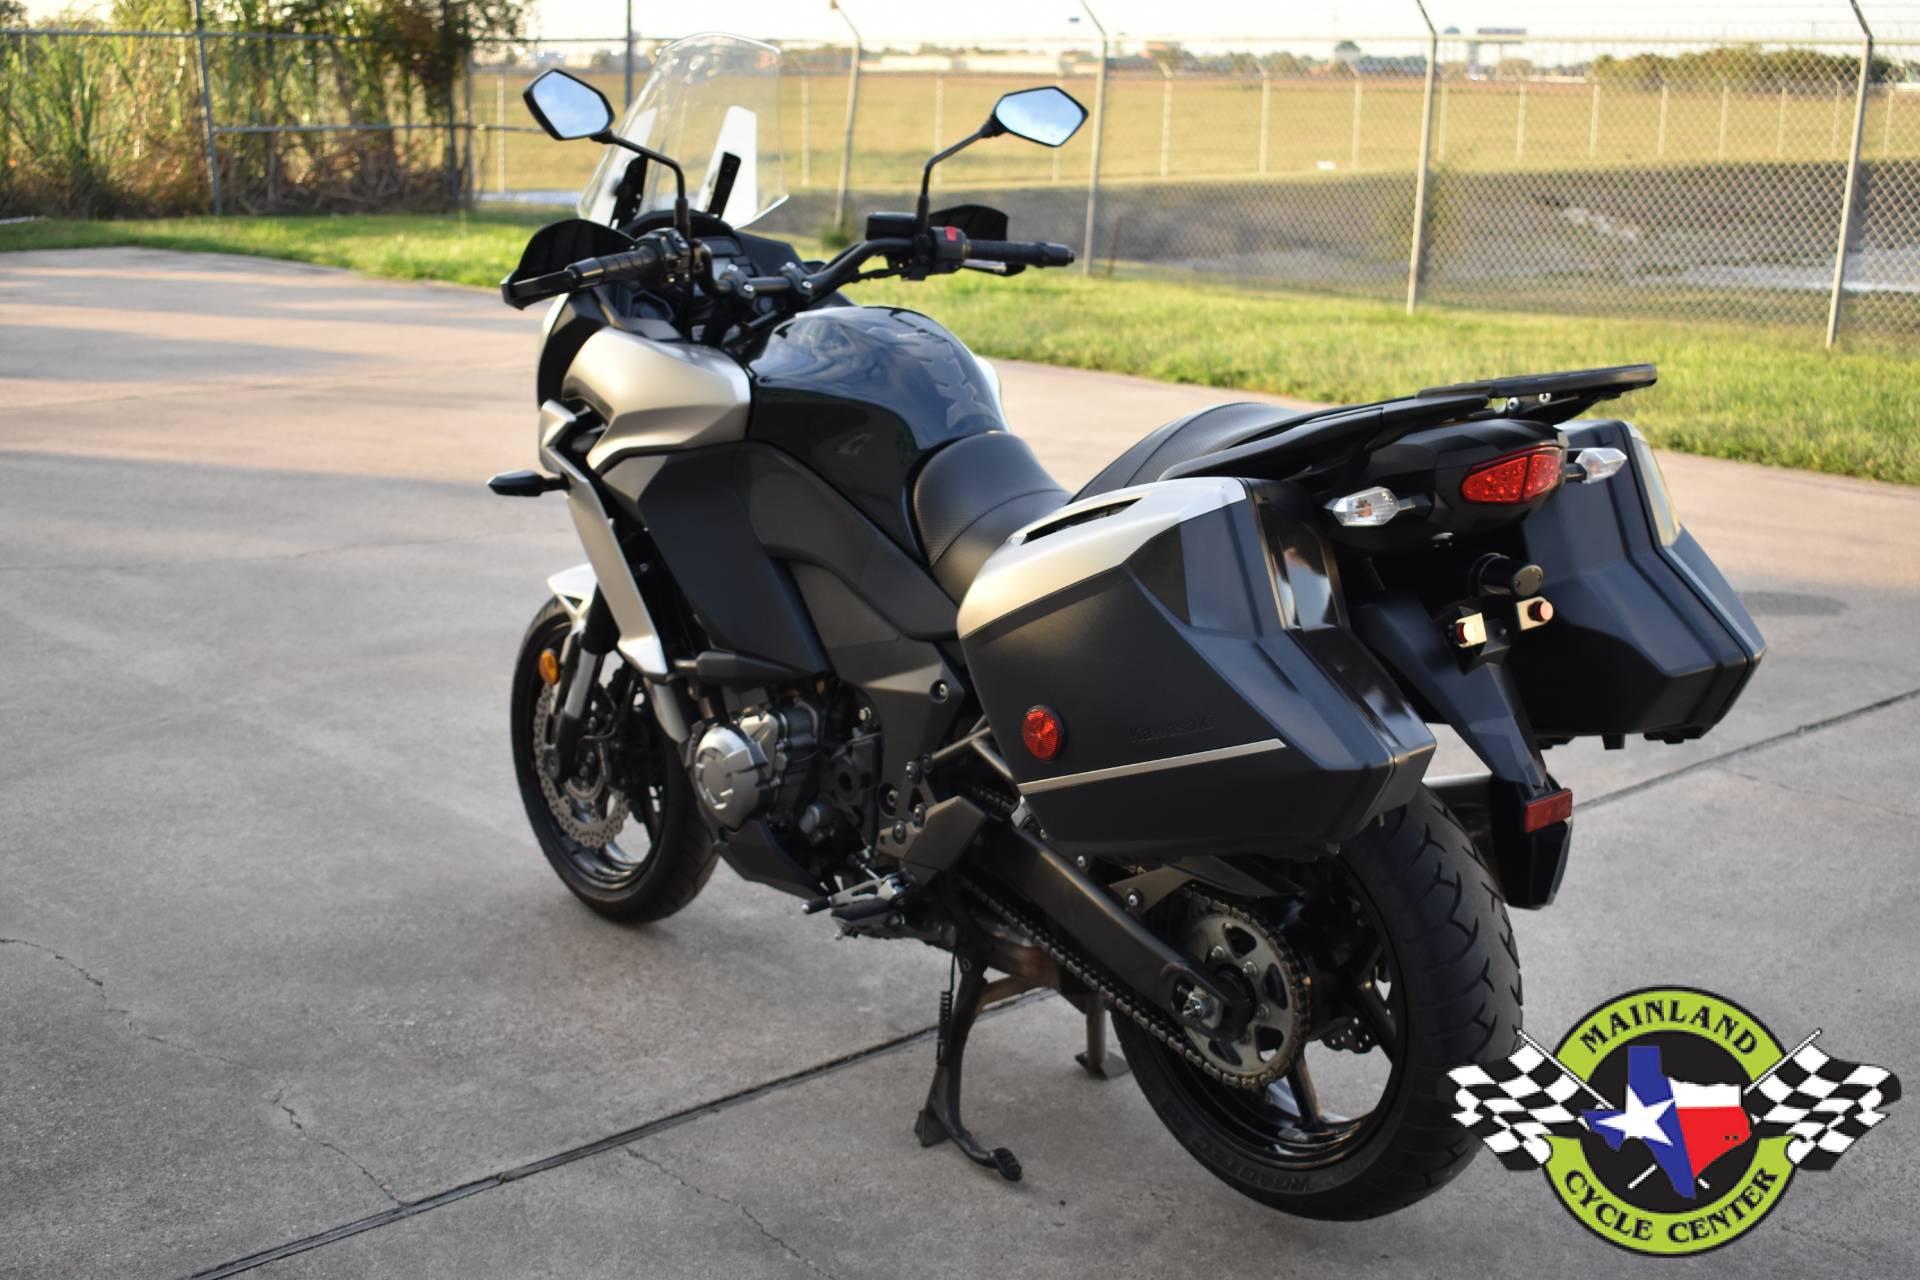 Used 2016 Kawasaki Versys 1000 LT Metallic Raw Titanium